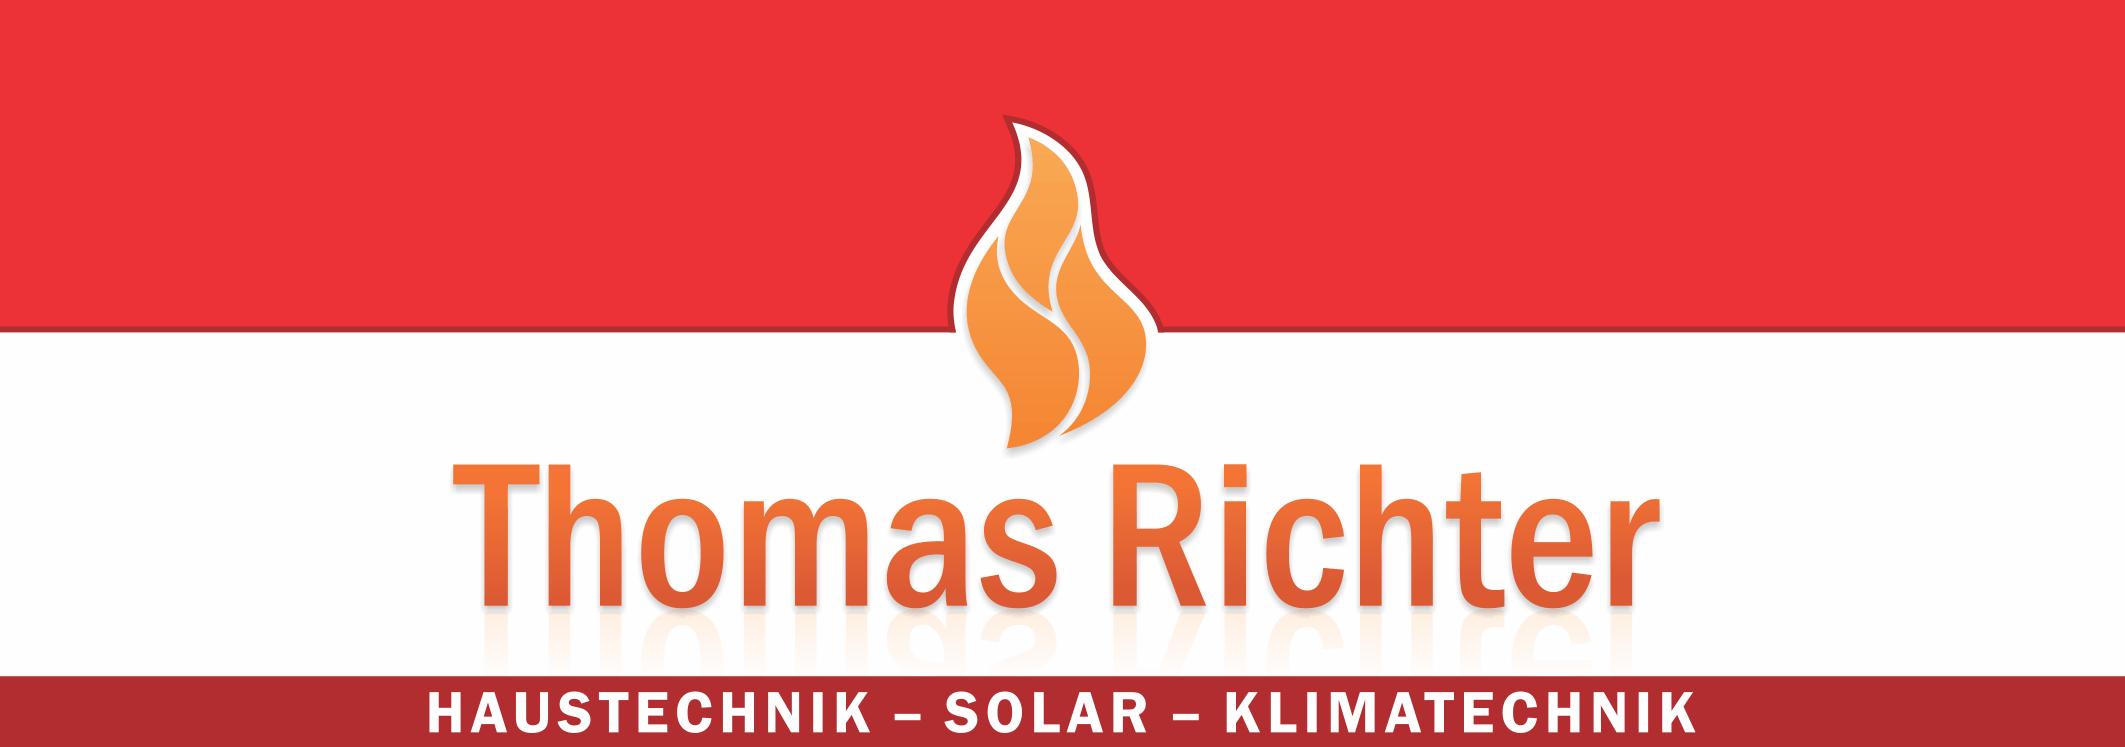 Thomas Richter Haustechnik – Solar- Klimatechnik